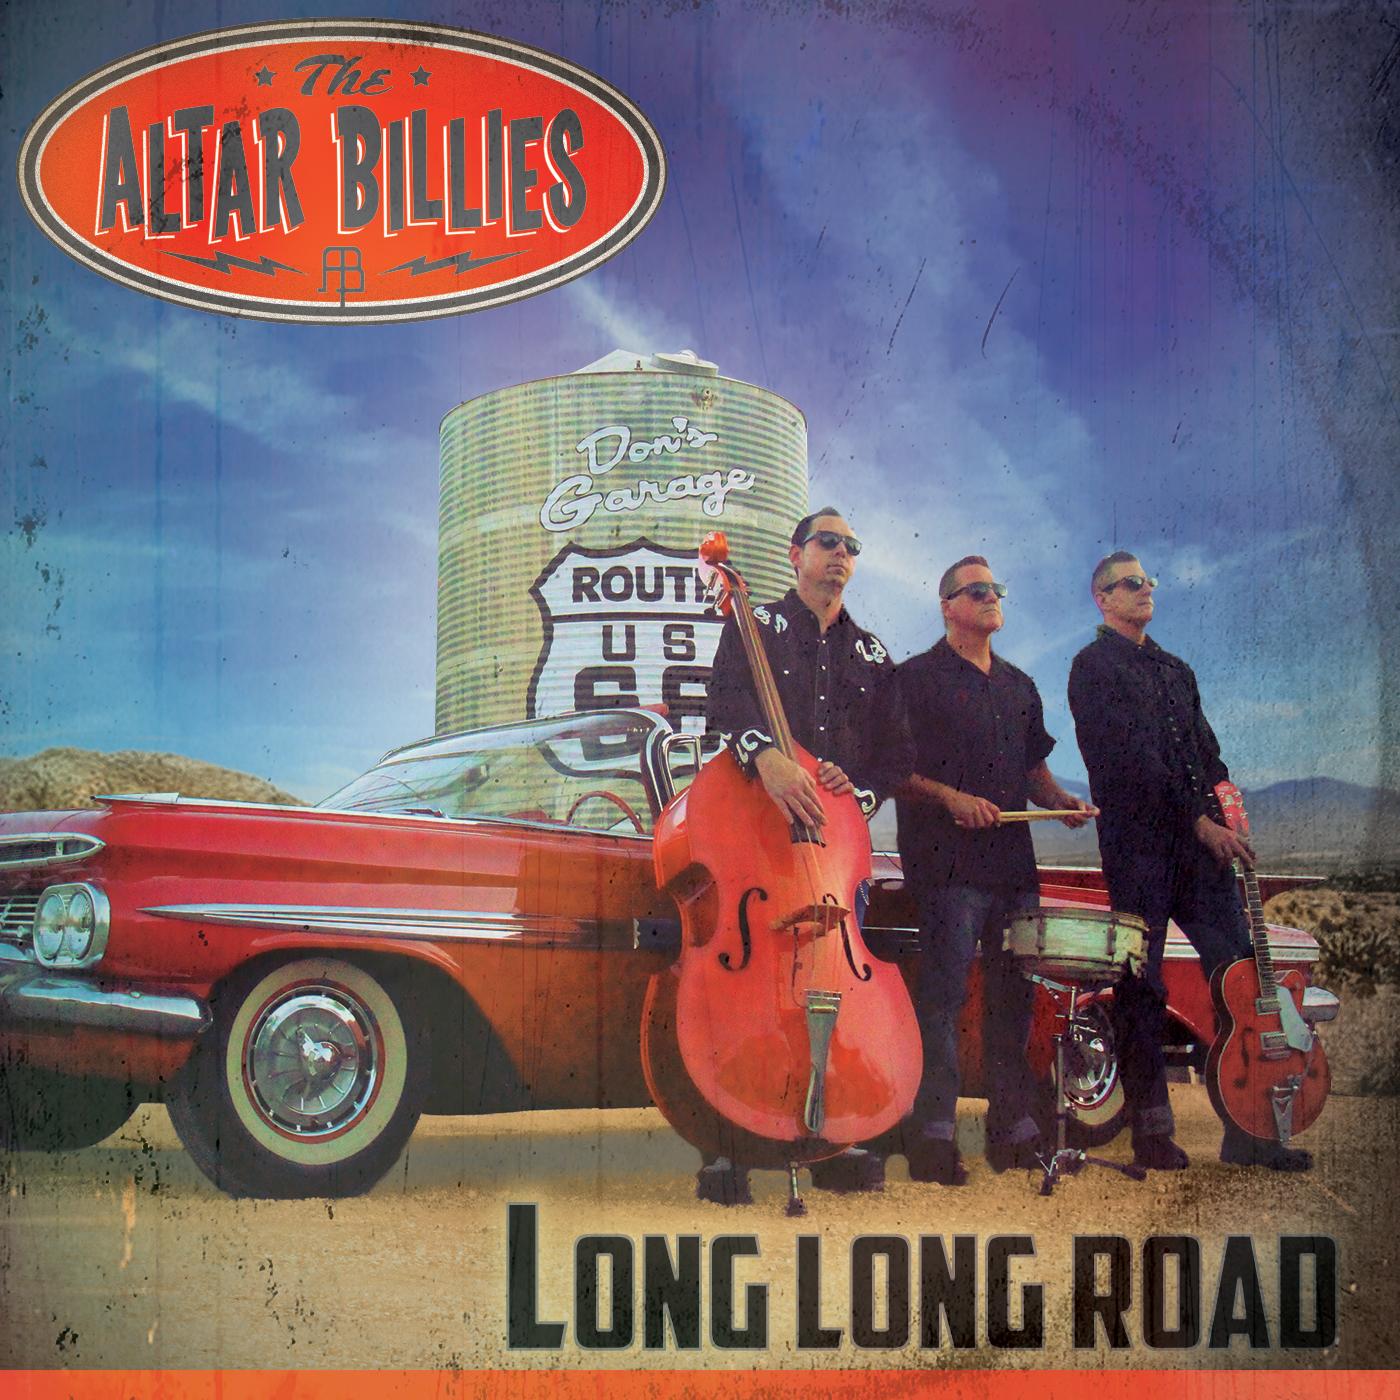 Long, Long Road (The Altar Billies, 2016)